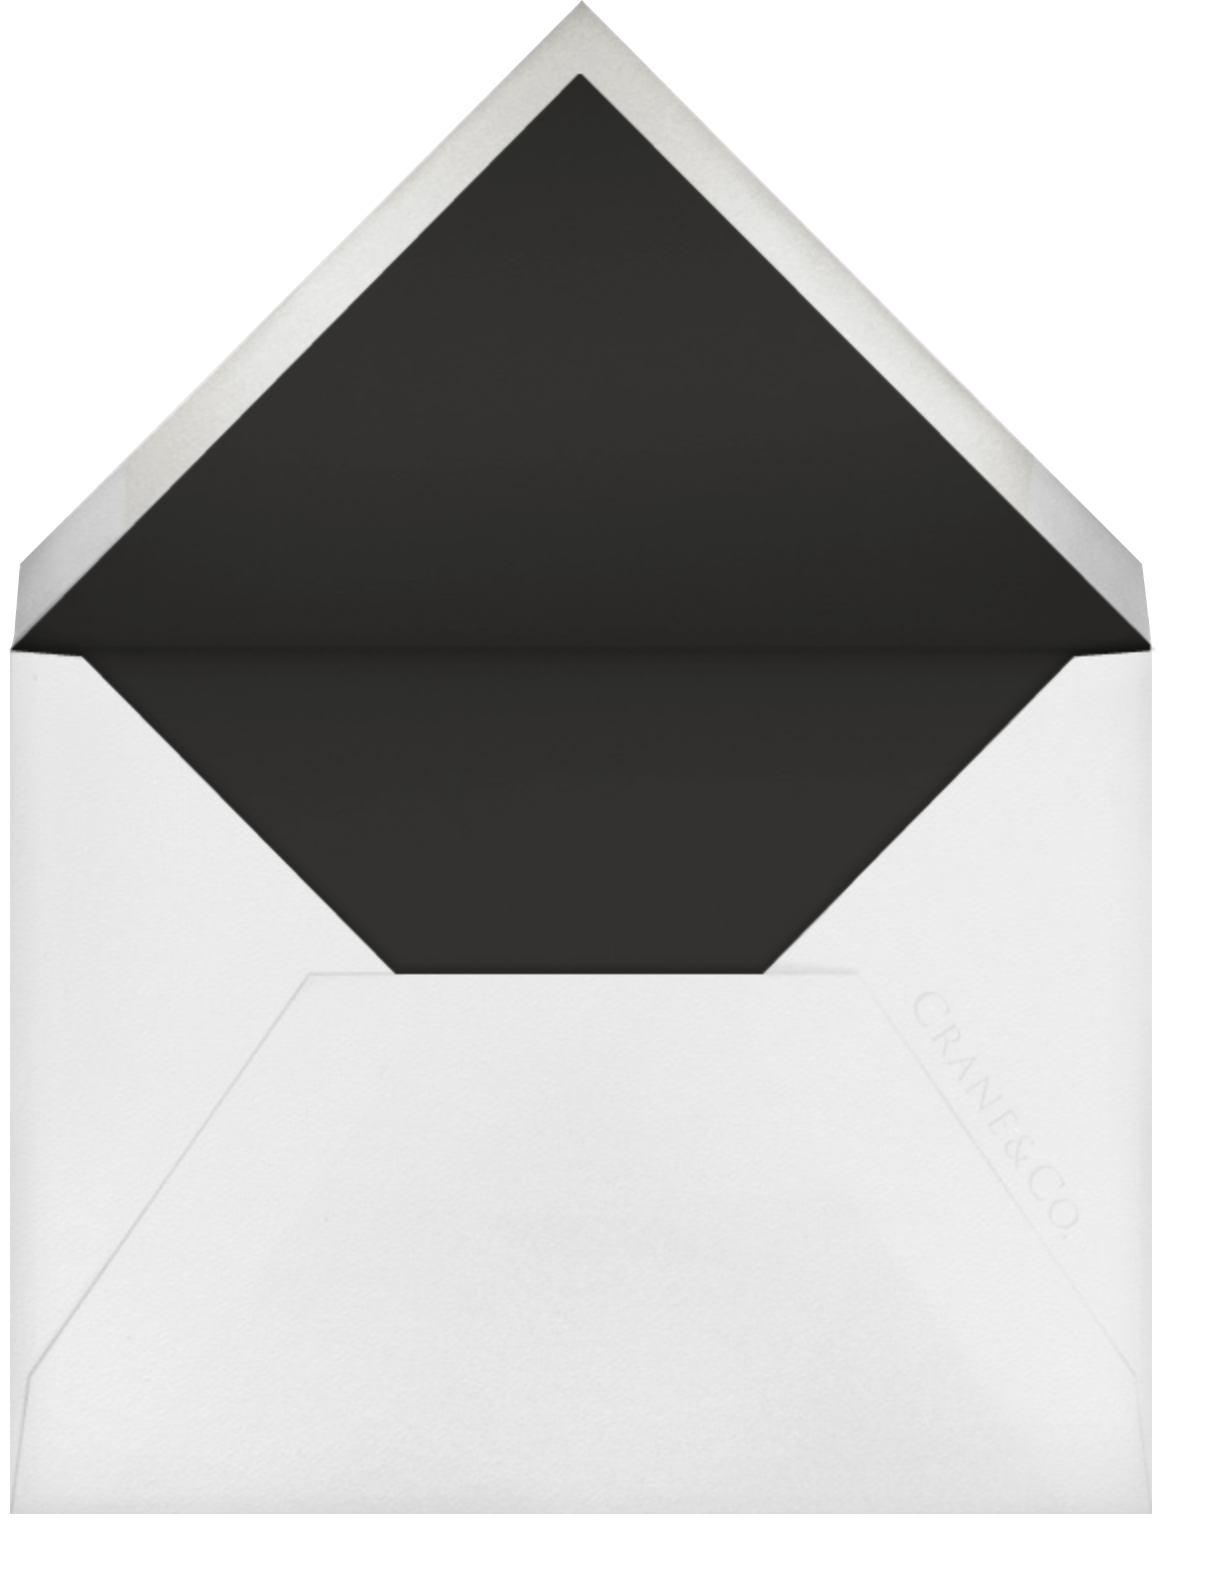 Octavo - Geranium - Paperless Post - Engagement party - envelope back